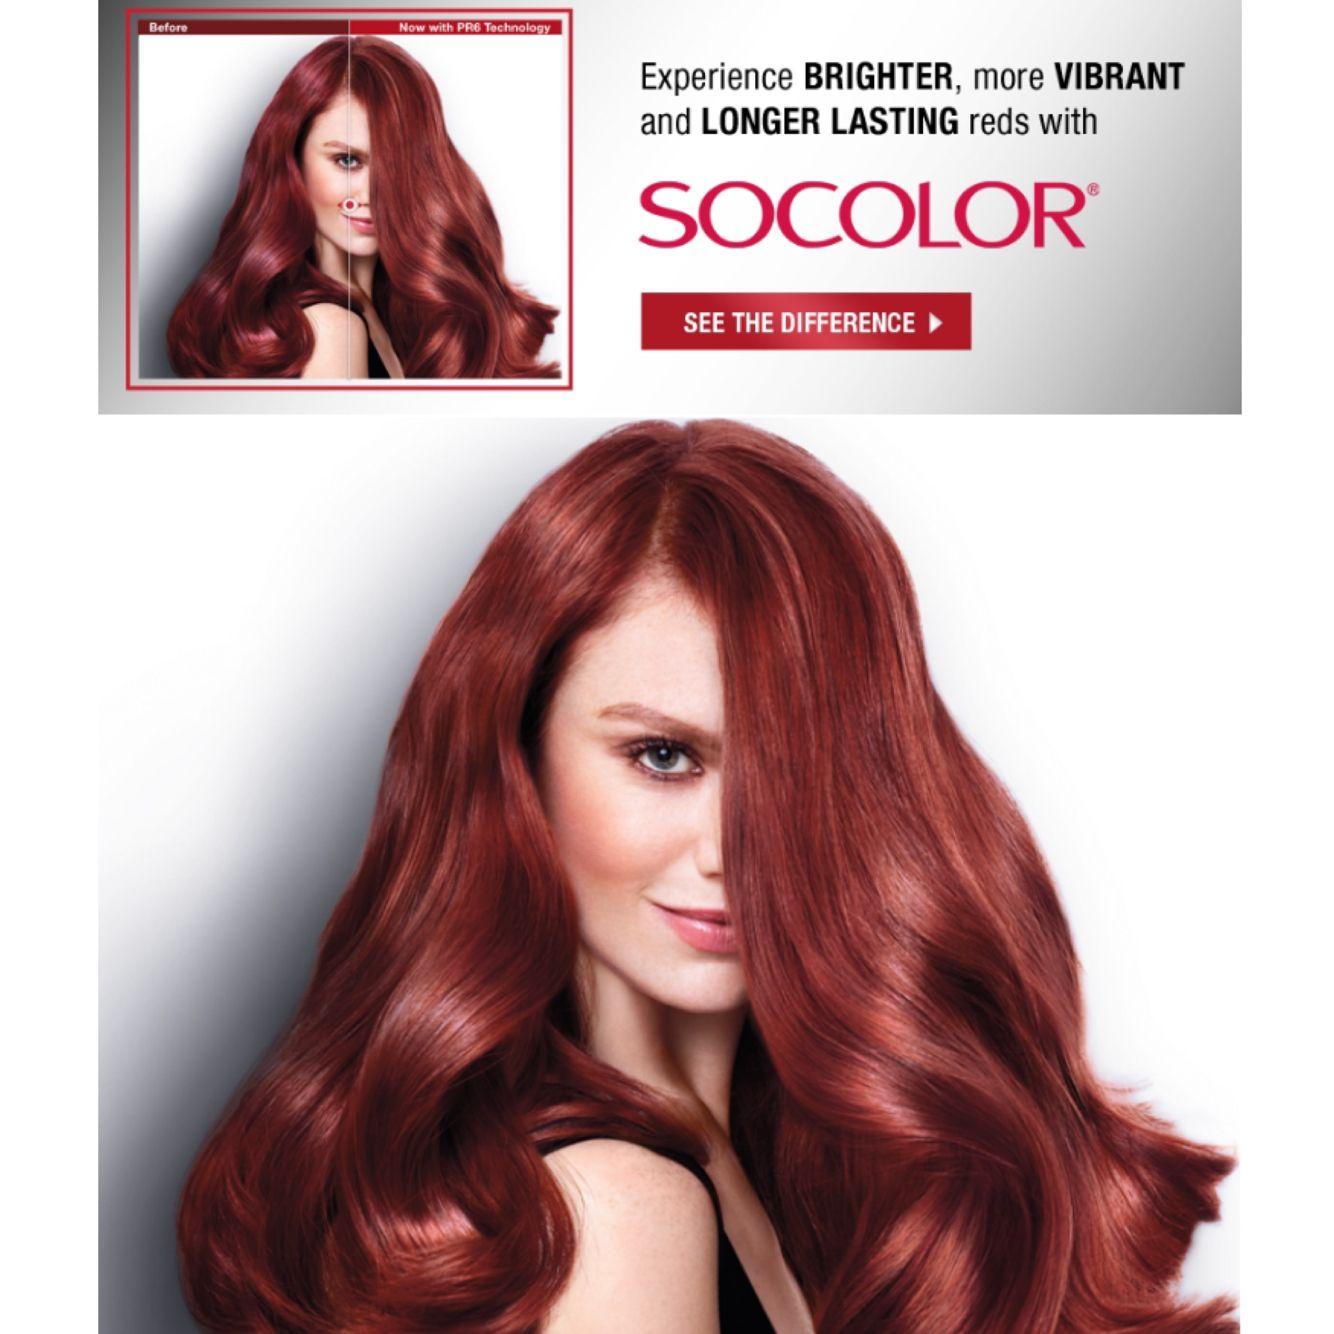 Loreal Matrix Redhead Haircampaign Musenyc Audracallo Socolor Advertisement Haircolor Matrix Hair Color Hair Fire Hair